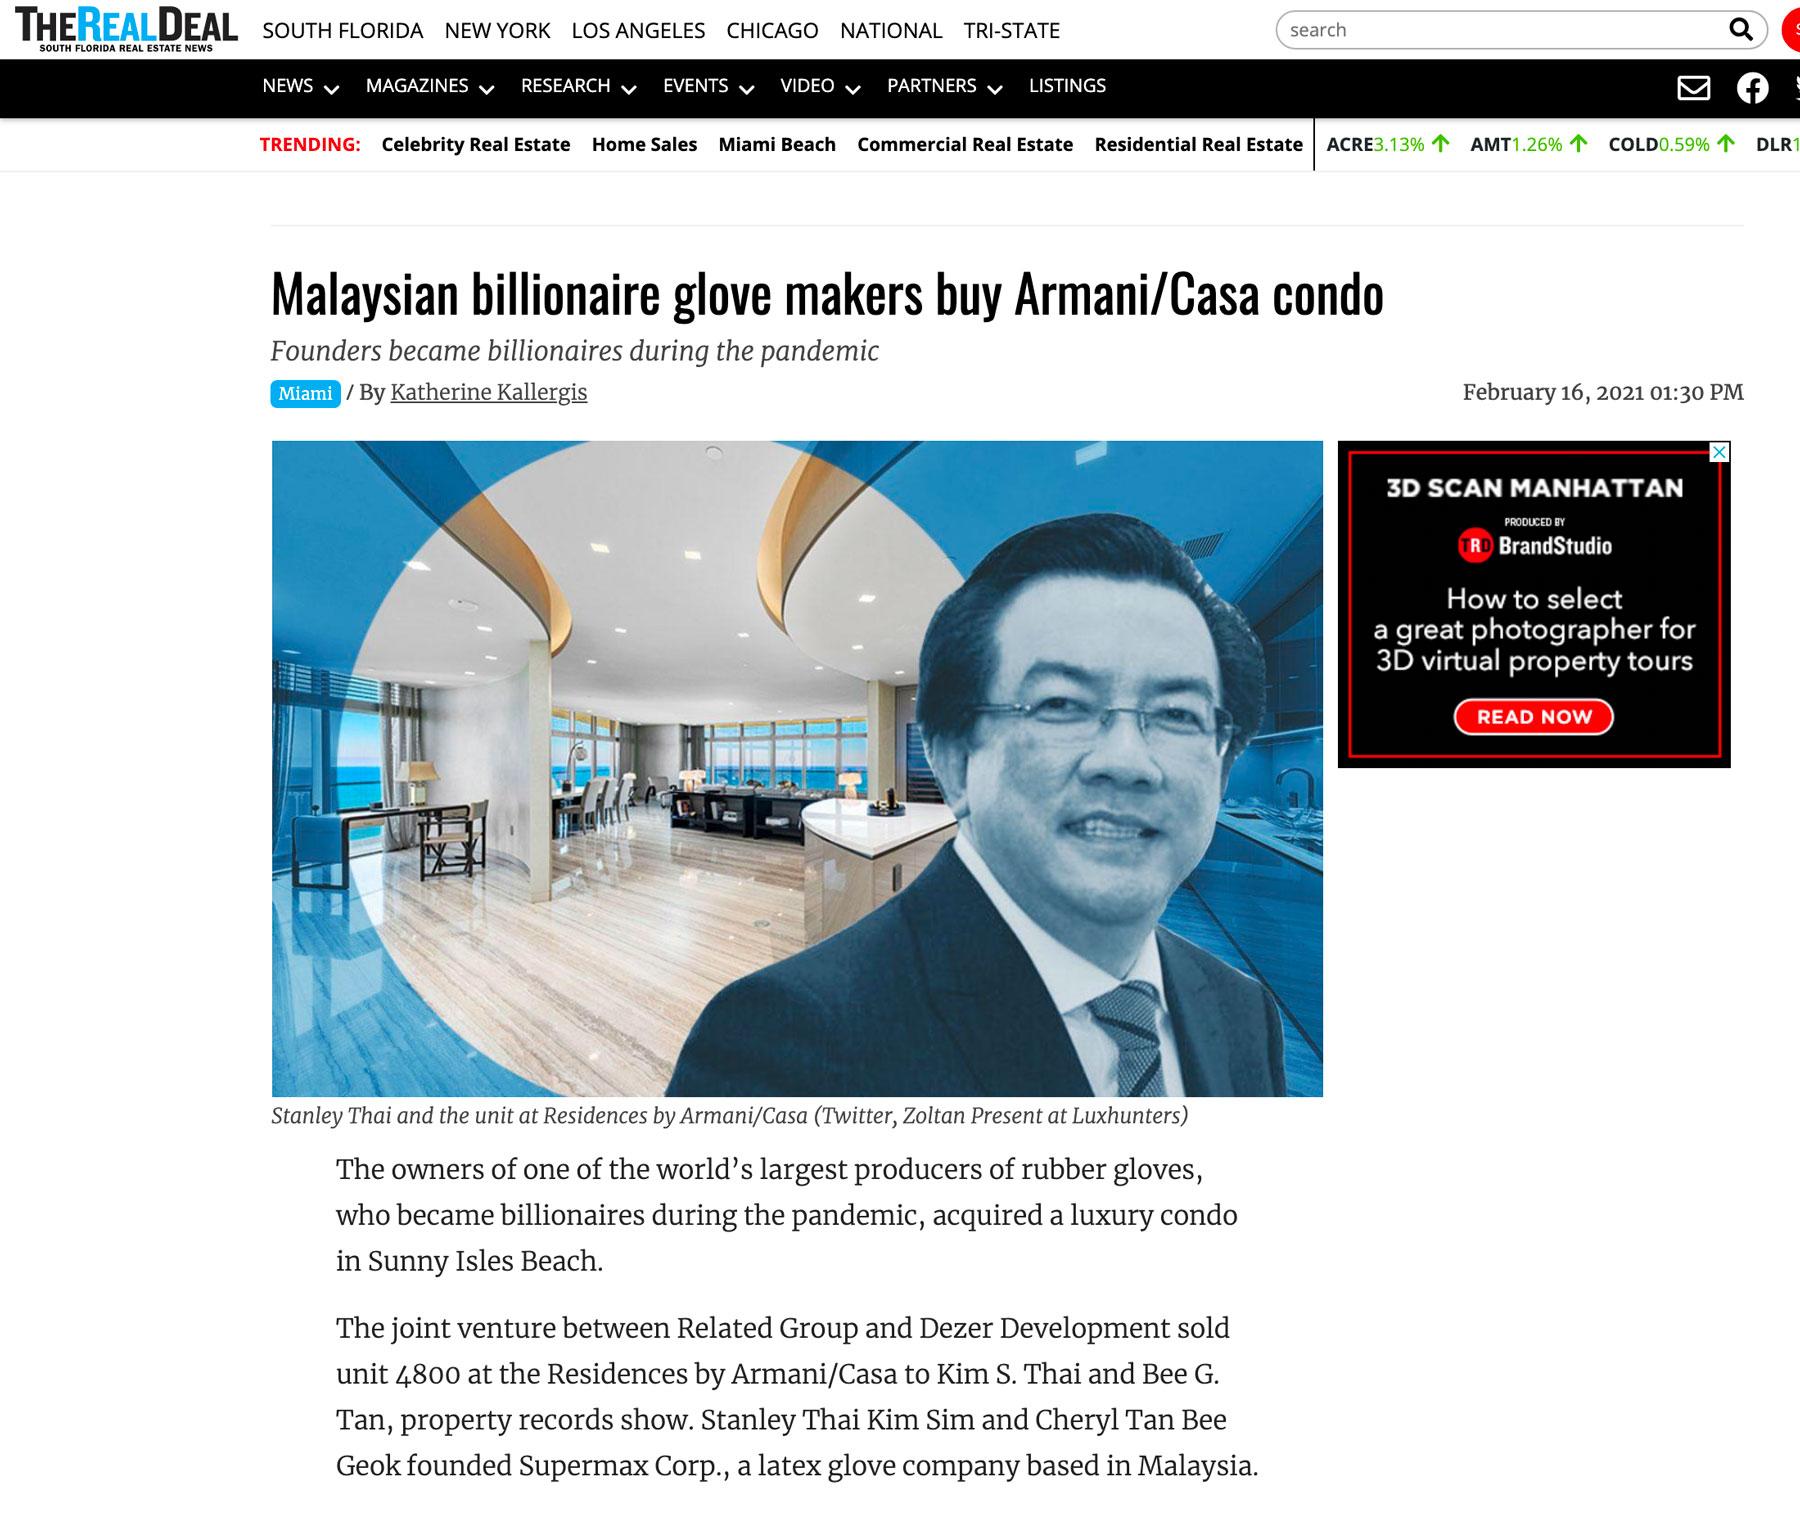 The Real Deal – Malaysian Billionaire Glove Makers Buy Armani/casa Condo